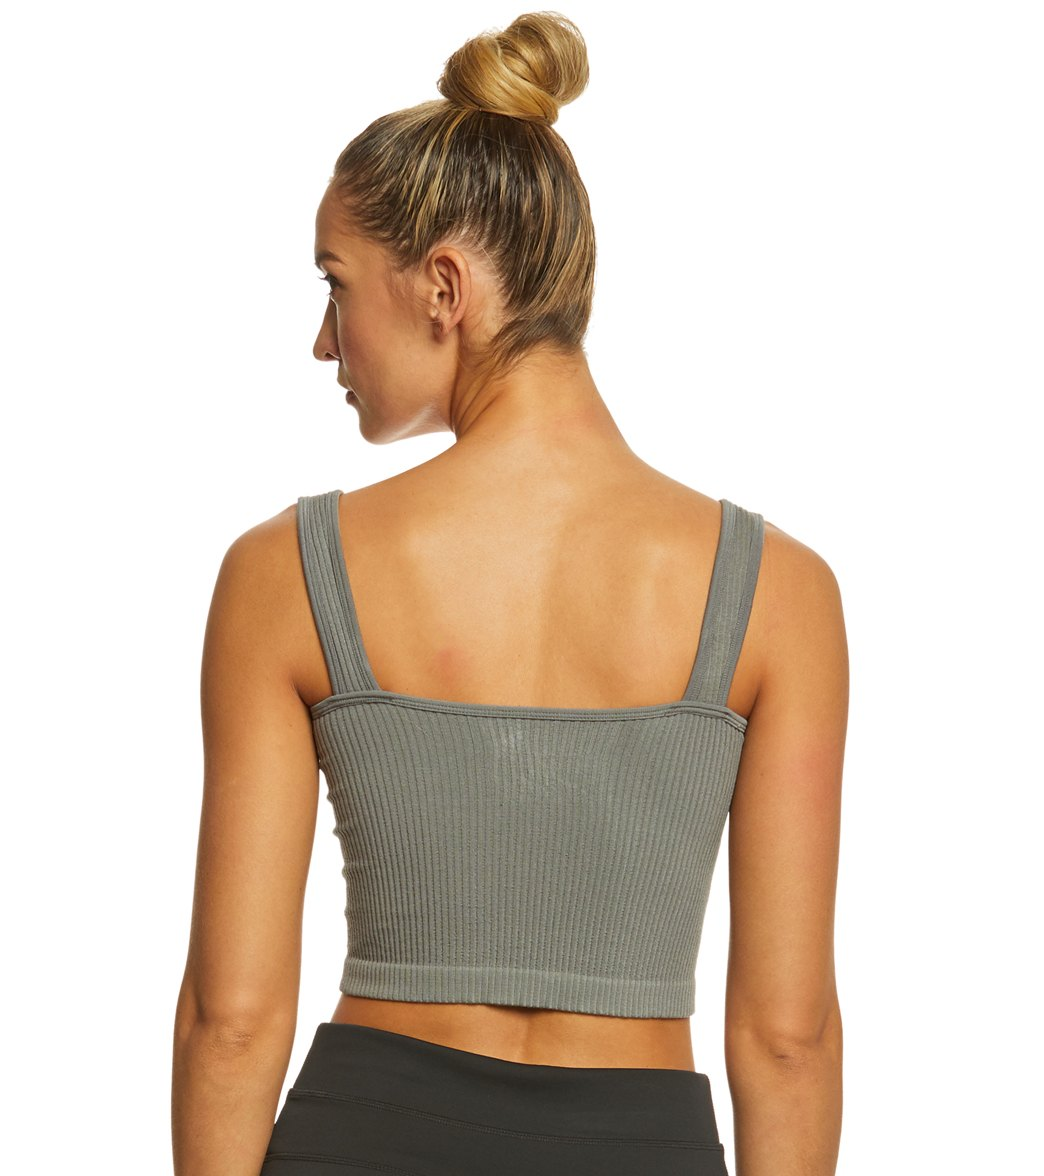 60434903e6064 Free People Solid Rib Brami Yoga Crop Top at YogaOutlet.com